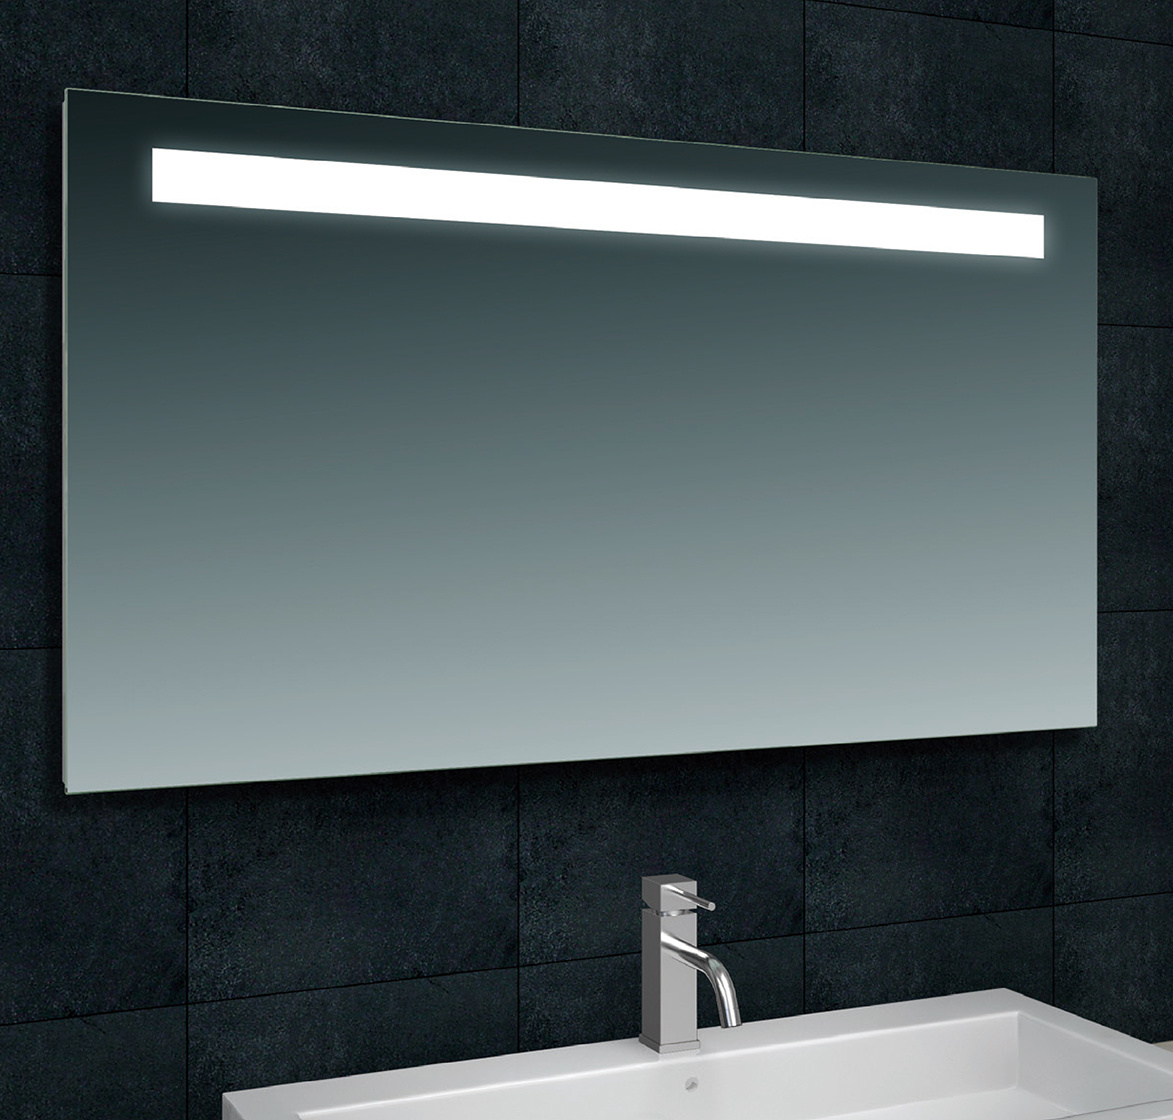 Wiesbaden Tigris spiegel met led verlichting 120 x 80 cm